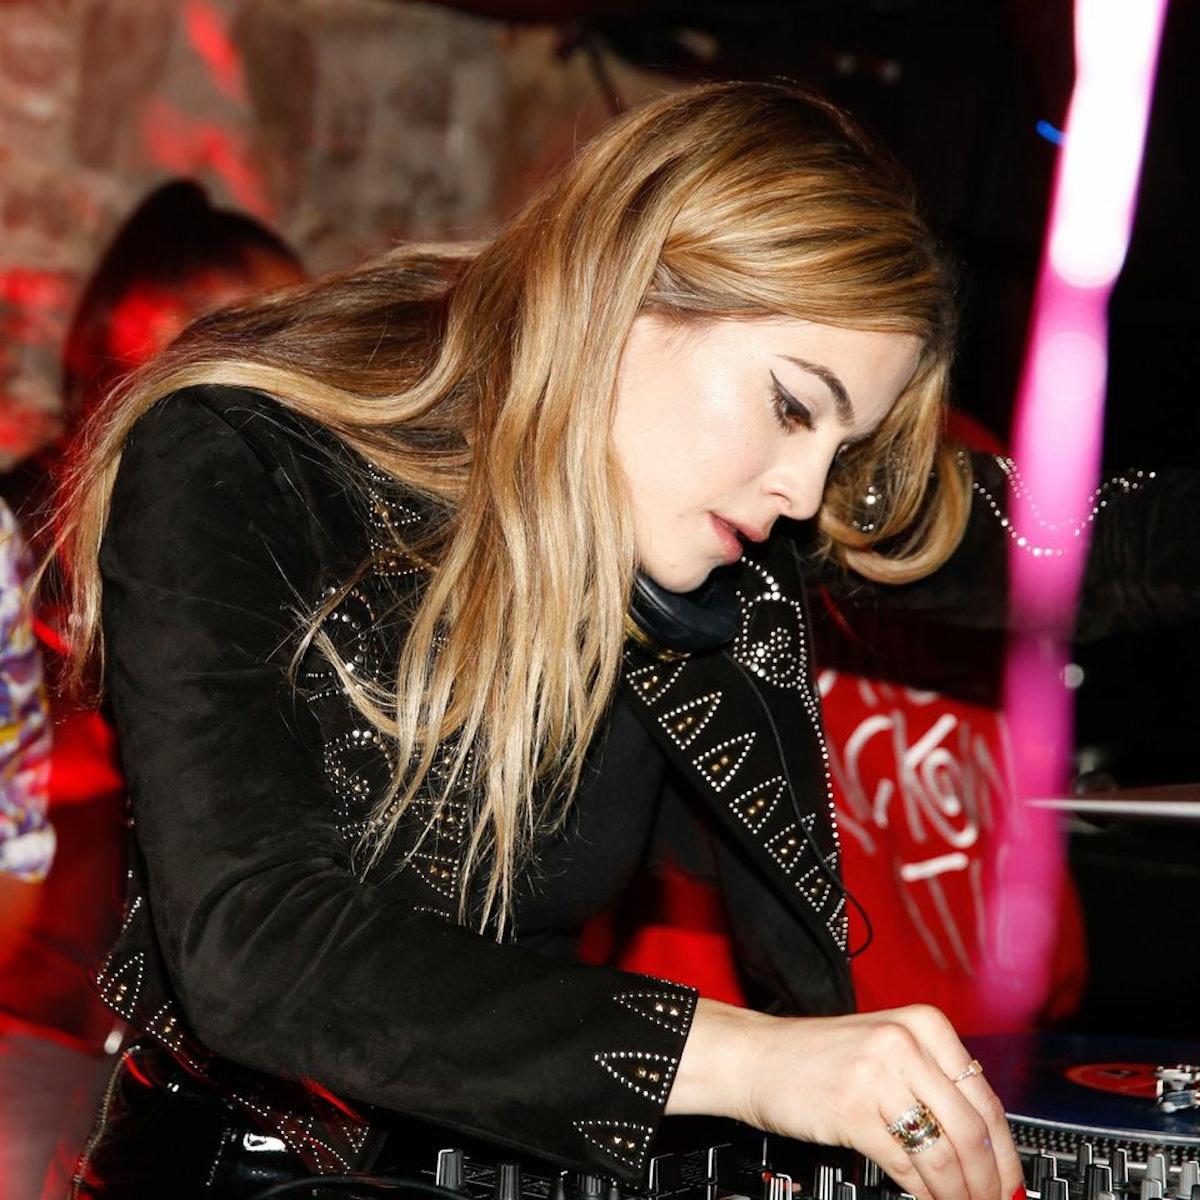 Chelsea Leyland DJs at Up & Down